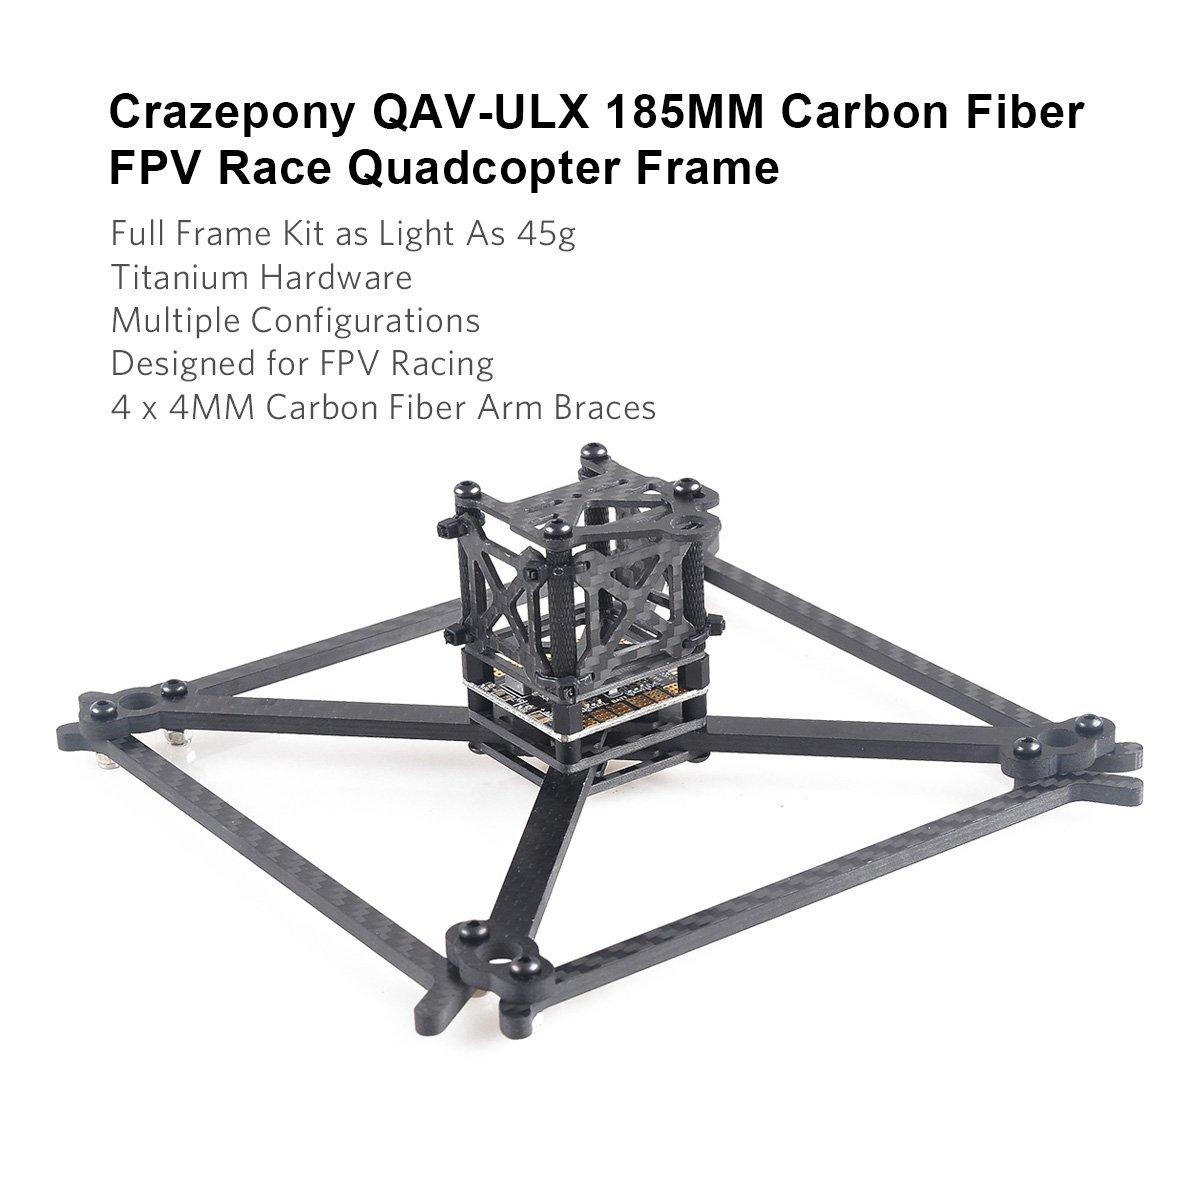 Crazepony Qav Ulx 185mm Carbon Fiber Fpv Race Quadcopter Wiring Configuration Frame Like 160 X210 X180 Etc4mm Toys Games